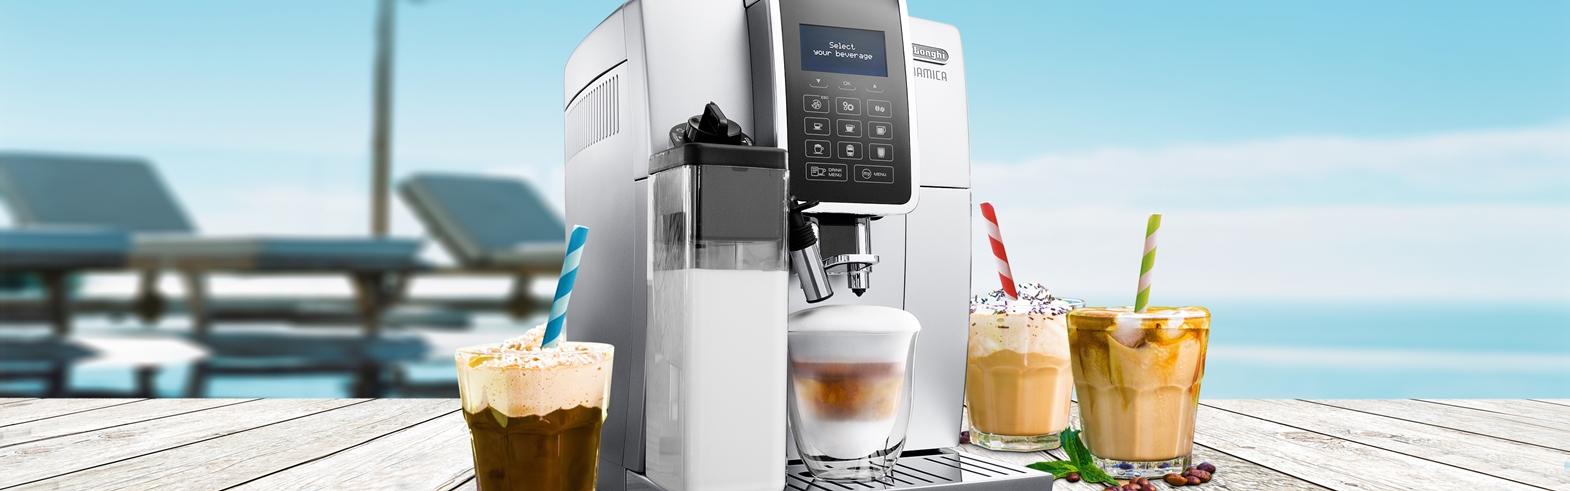 De'Longhi Espressomachine | ijsmachine + receptenboek cadeau